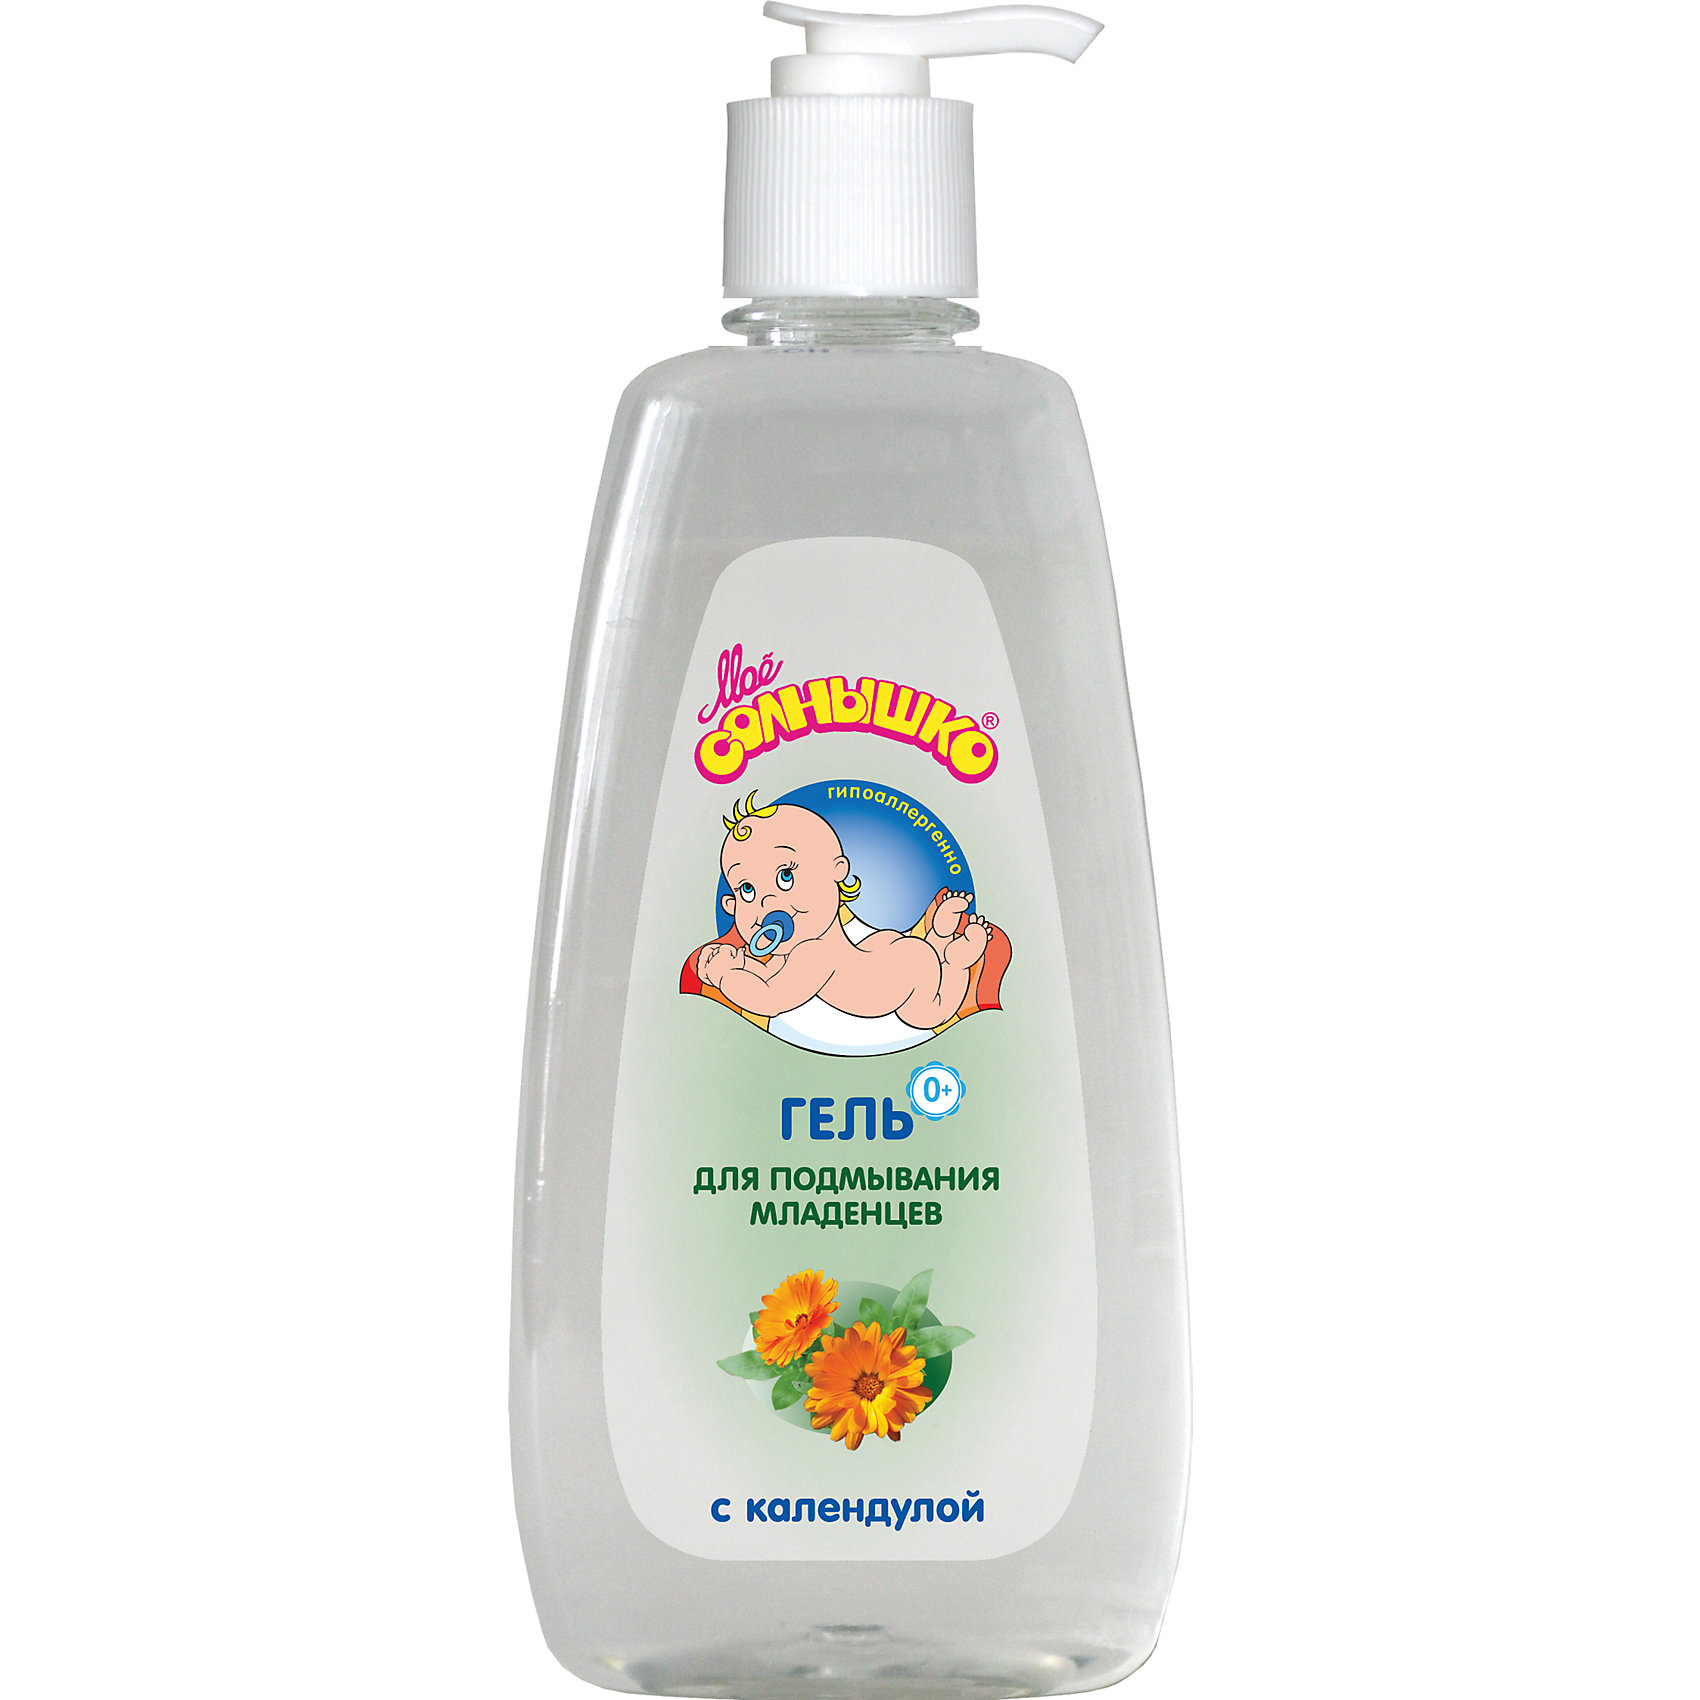 Моё солнышко Гель для подмывания младенцев с календулой 200 мл, Моё солнышко моё солнышко для подмывания младенцев 200 мл